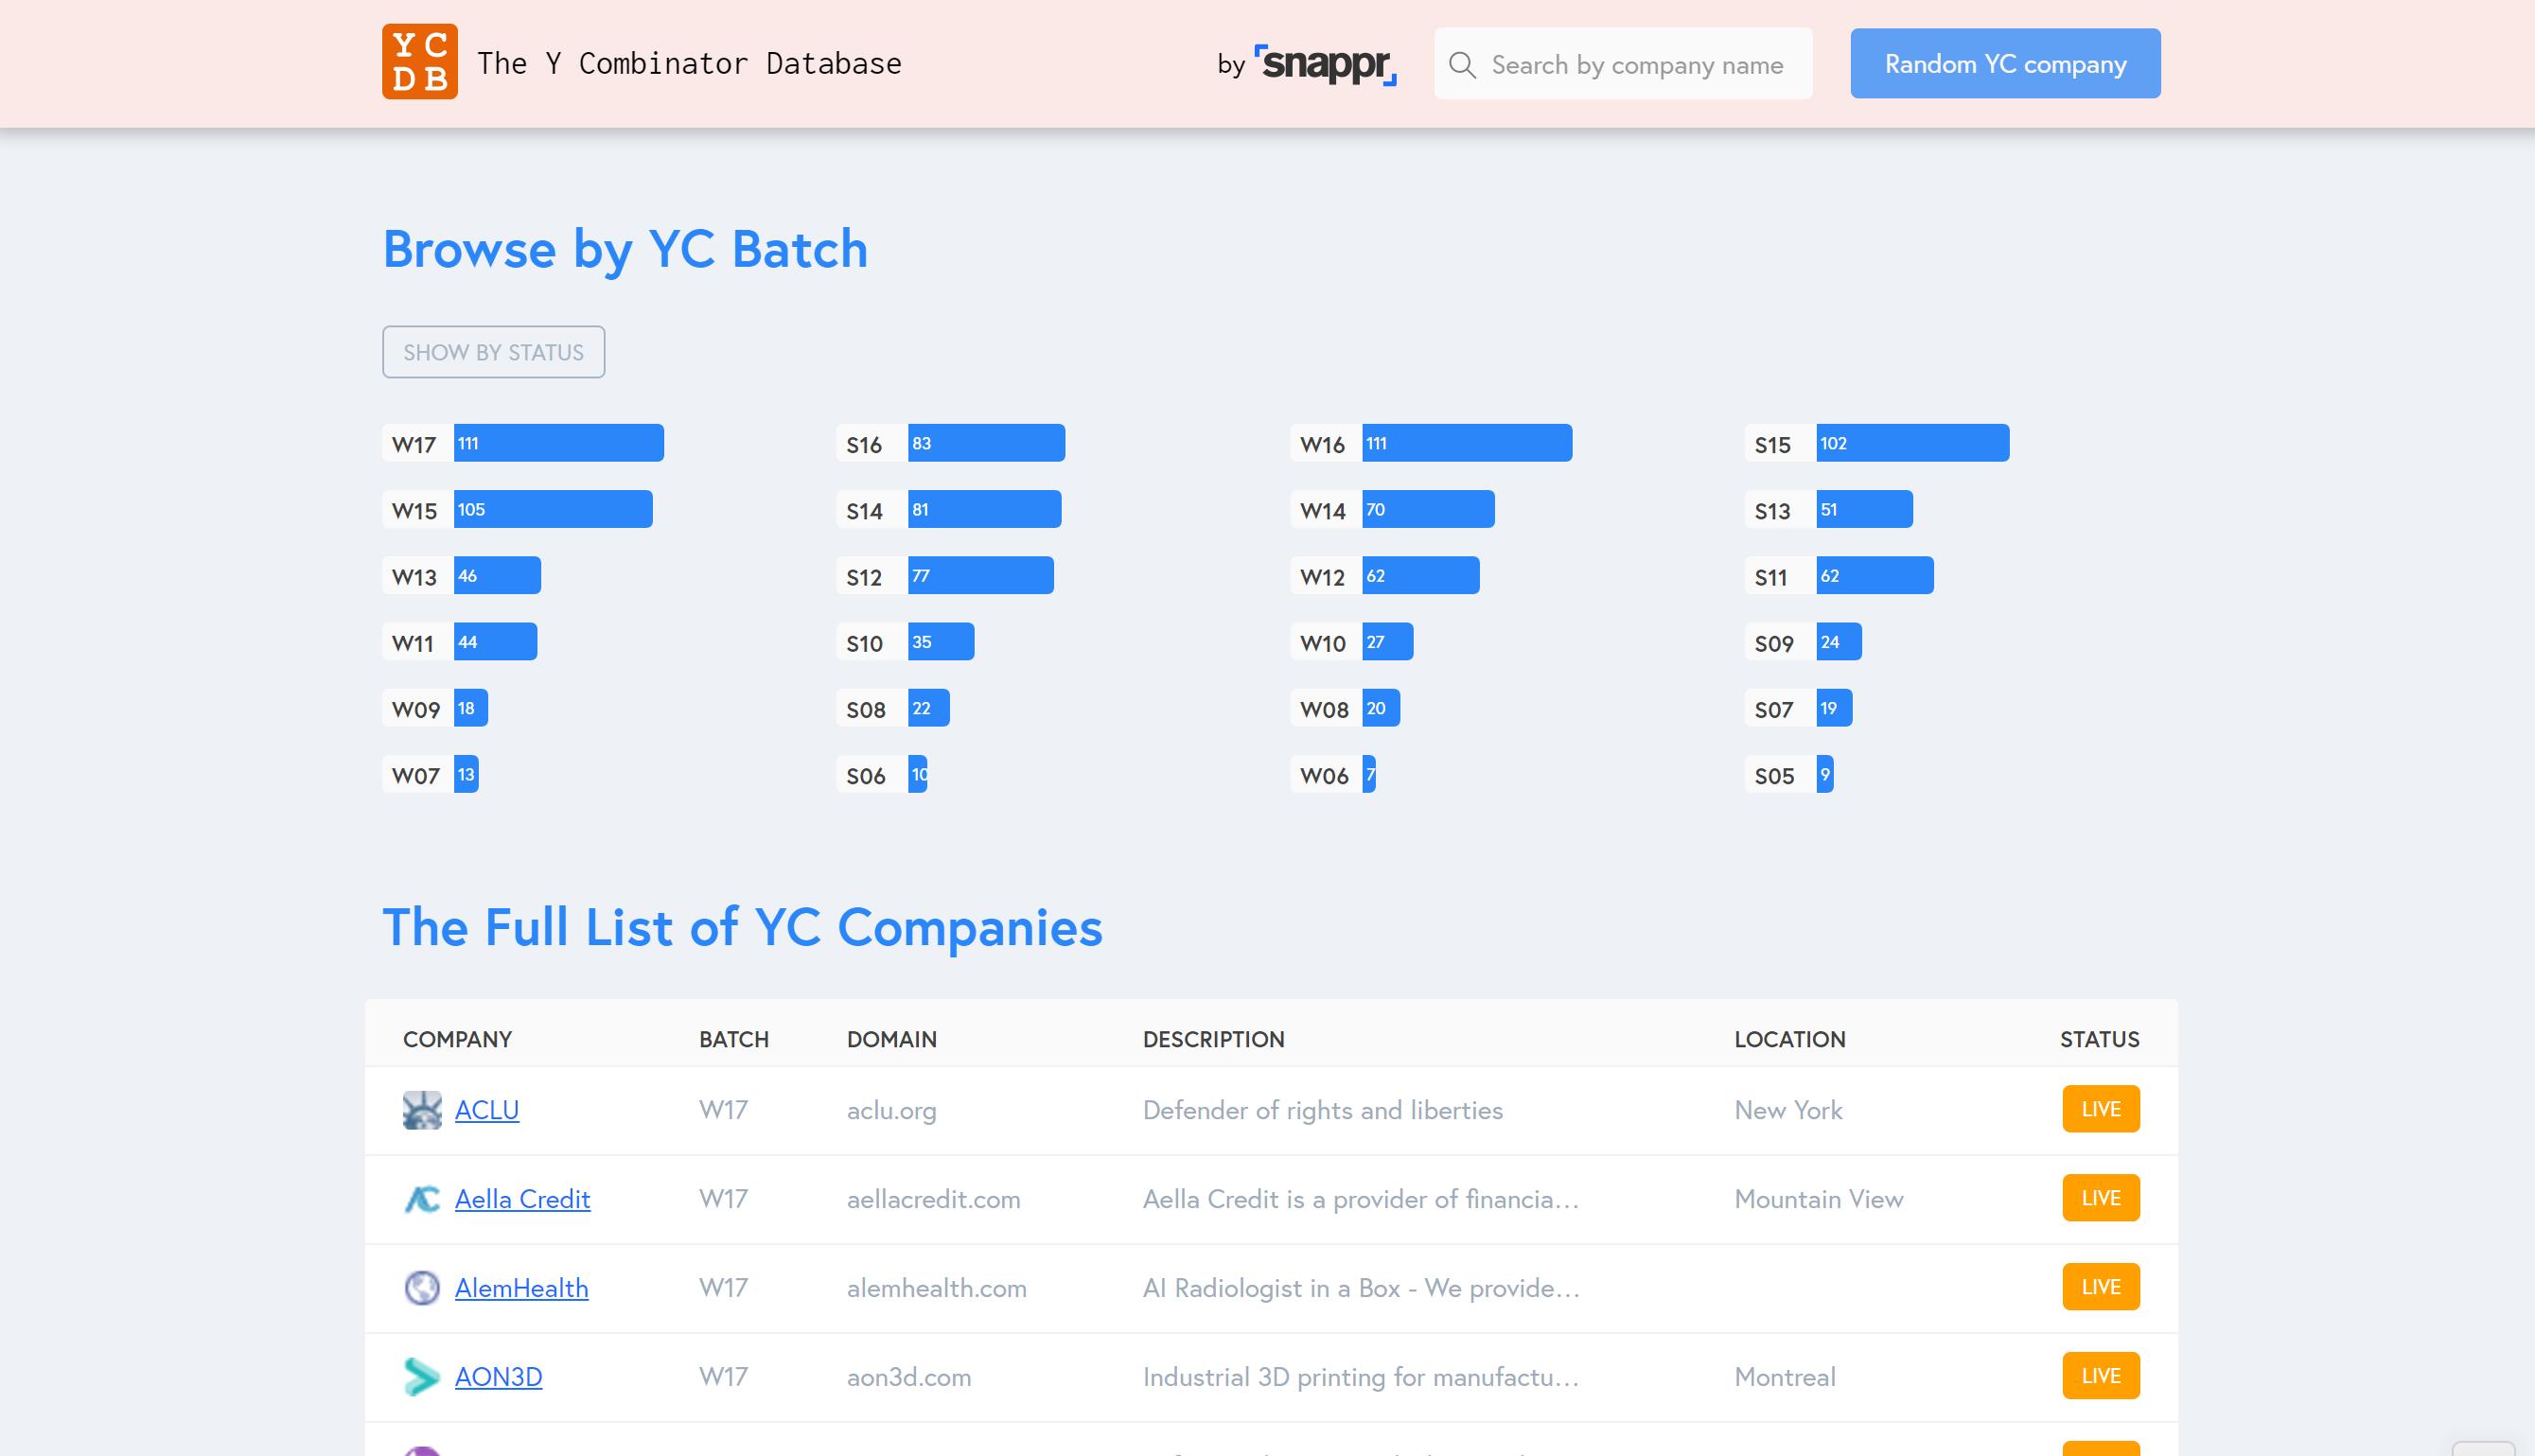 YCDB - The Y Combinator Database